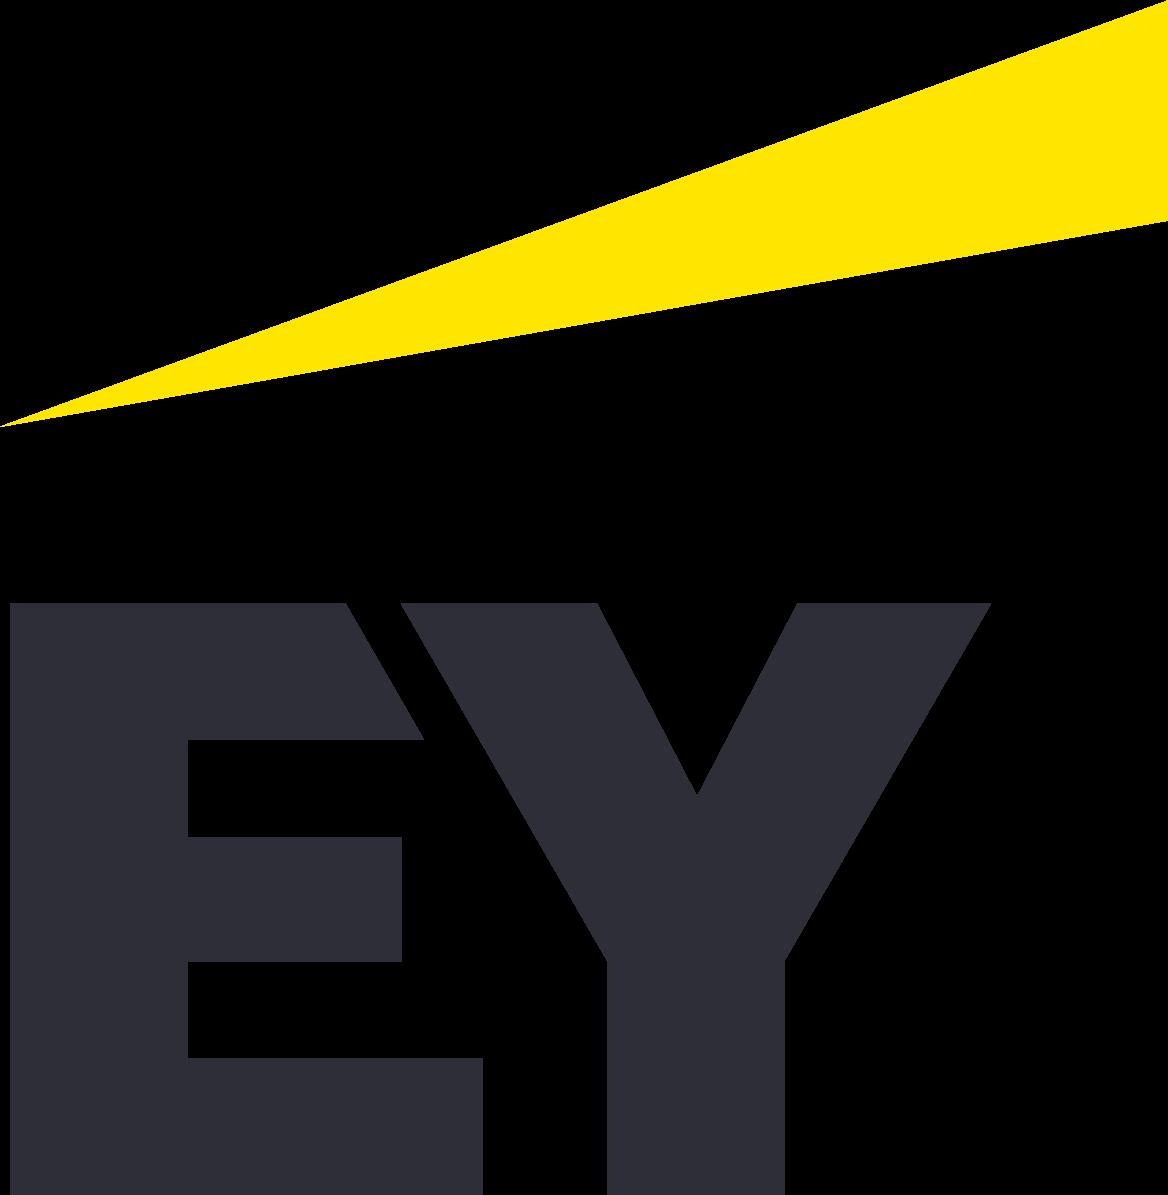 EY_Logo_Beam_RGB-OffBlack-Yellow.png